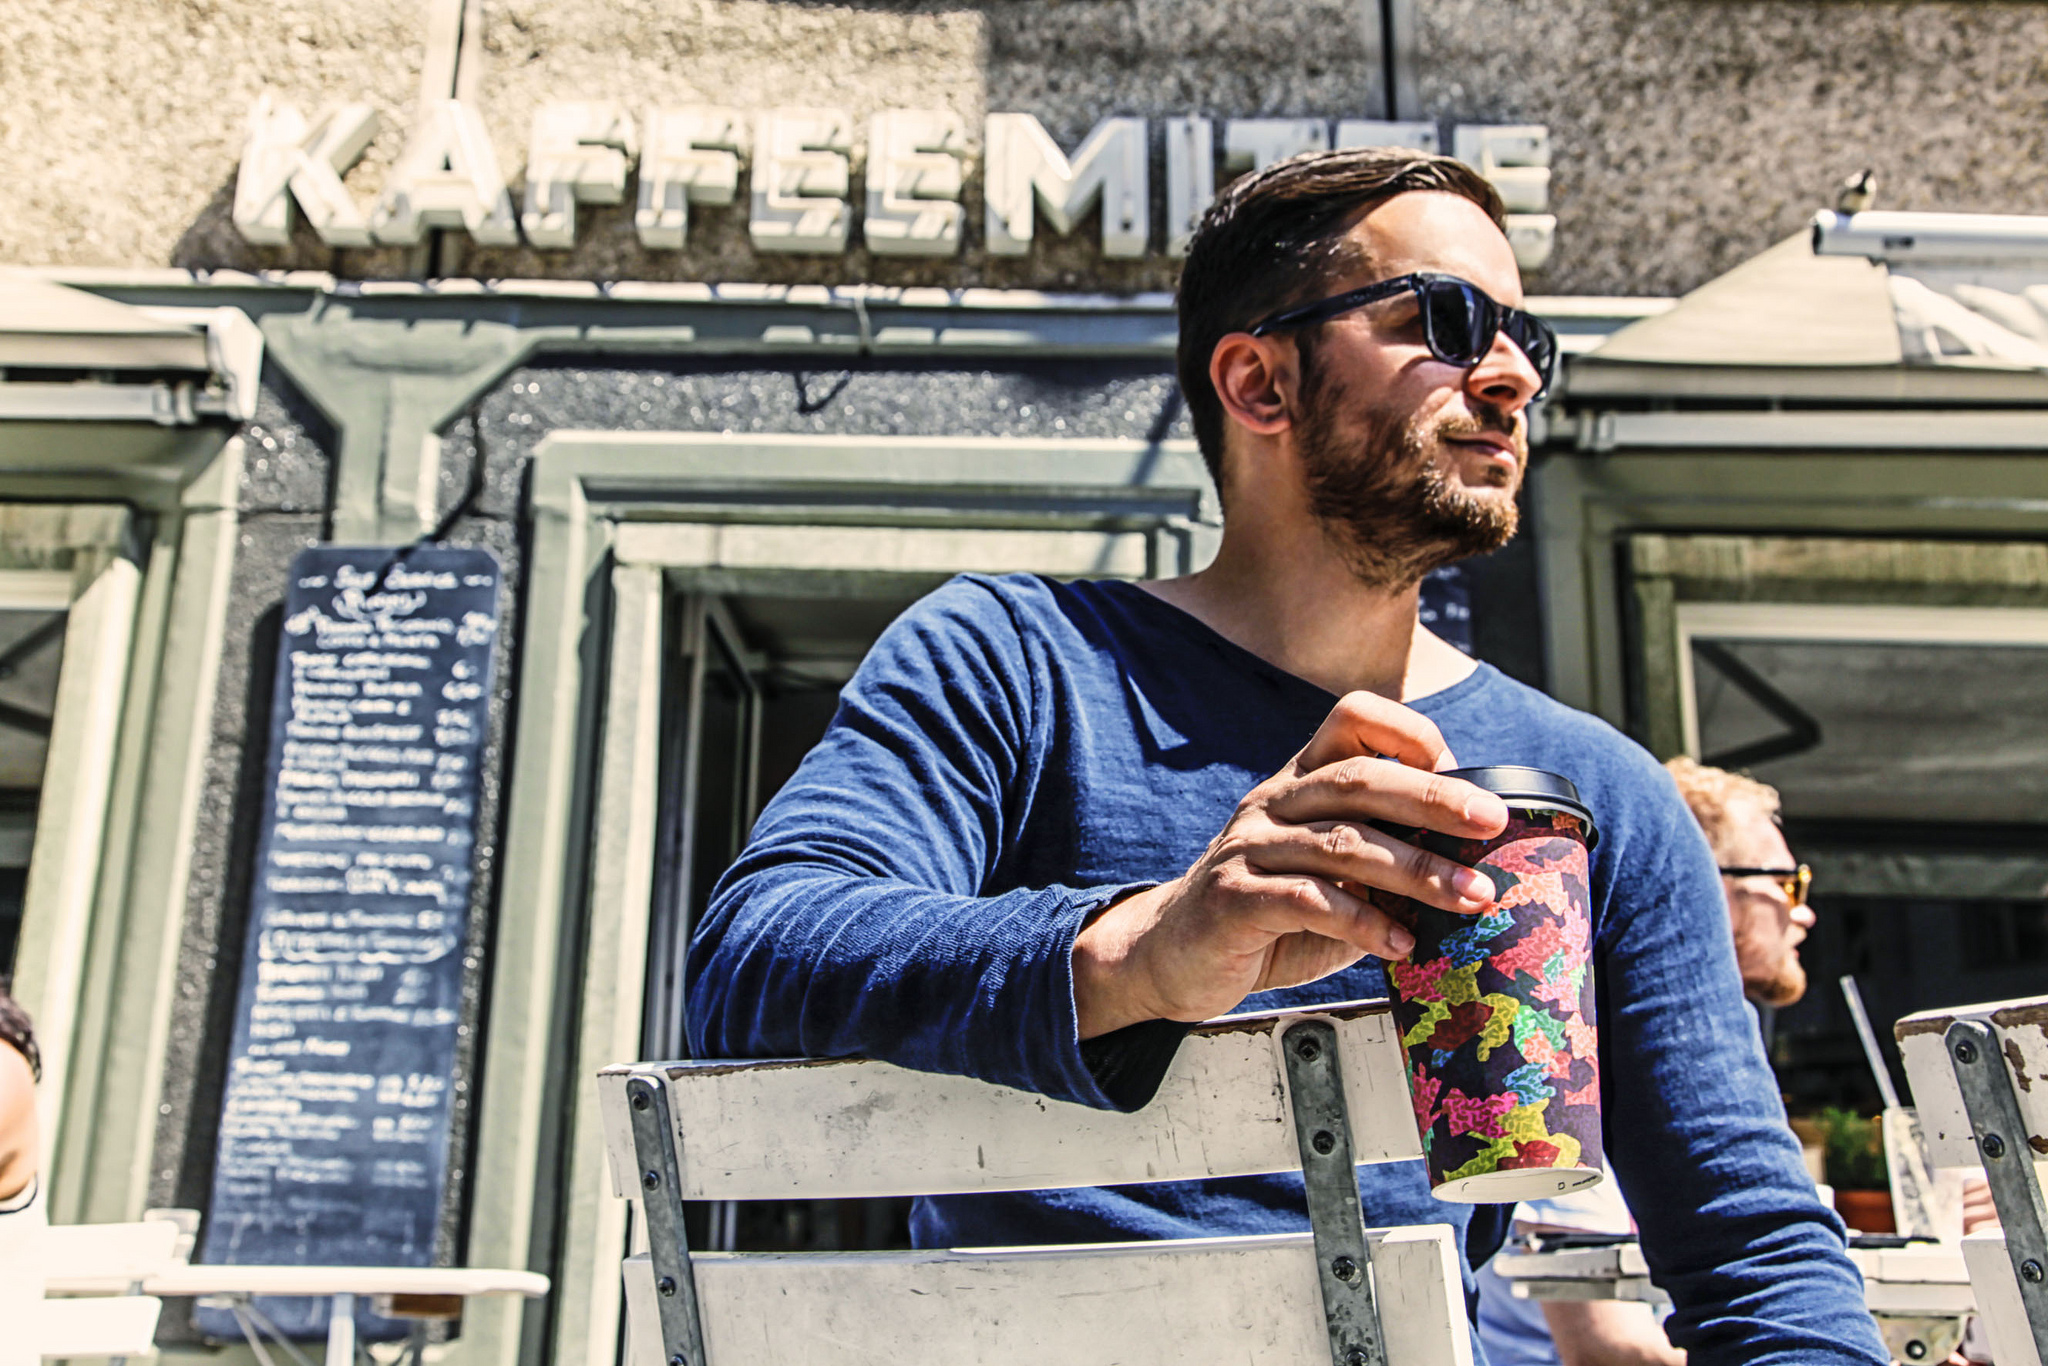 Kaffeemitte _©Happy Cups-Flickr (http_--www.flickr.com)